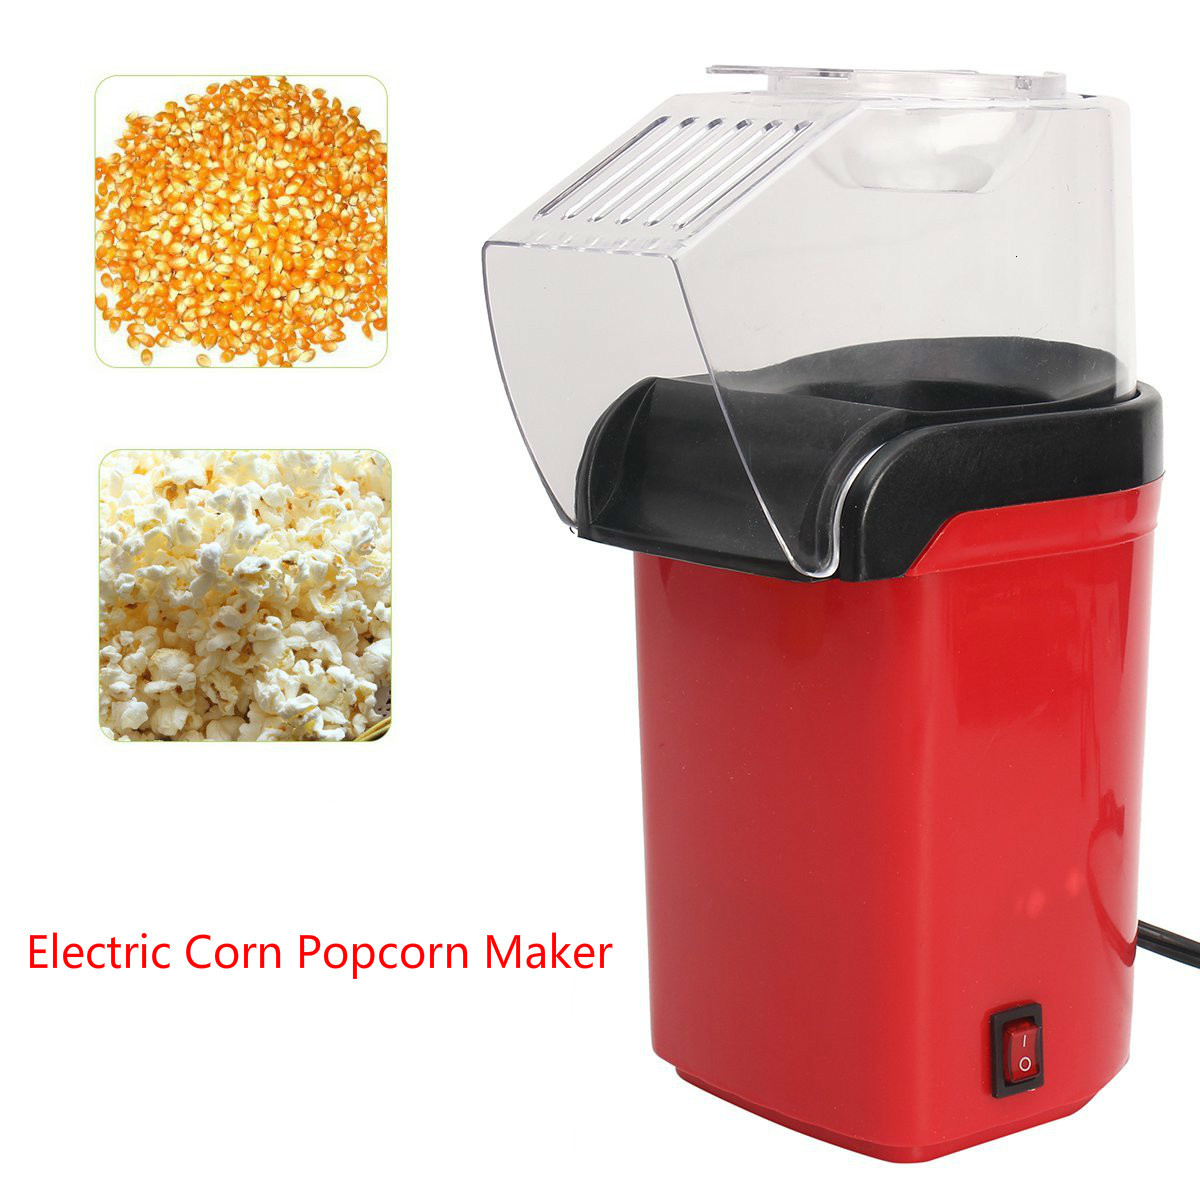 Electric Corn Popcorn Maker 110/220V Household Automatic Mini Hot Air Popcorn Making Machine DIY Corn Popper Children Gift